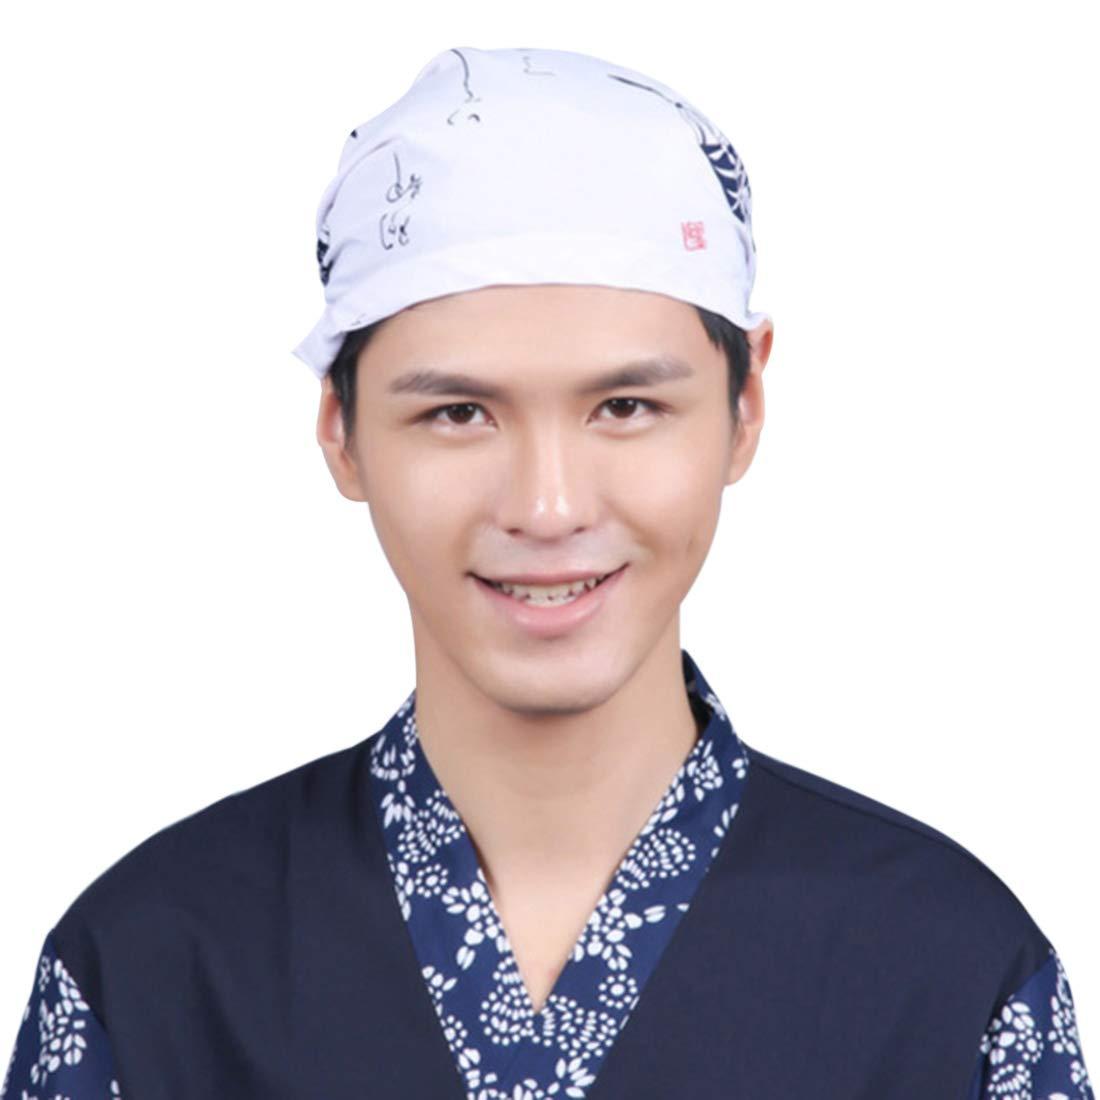 YUENA CARE Sushi Japanese Chefs Hat Kitchen Restaurant Cooking Cap Baking Work Hats